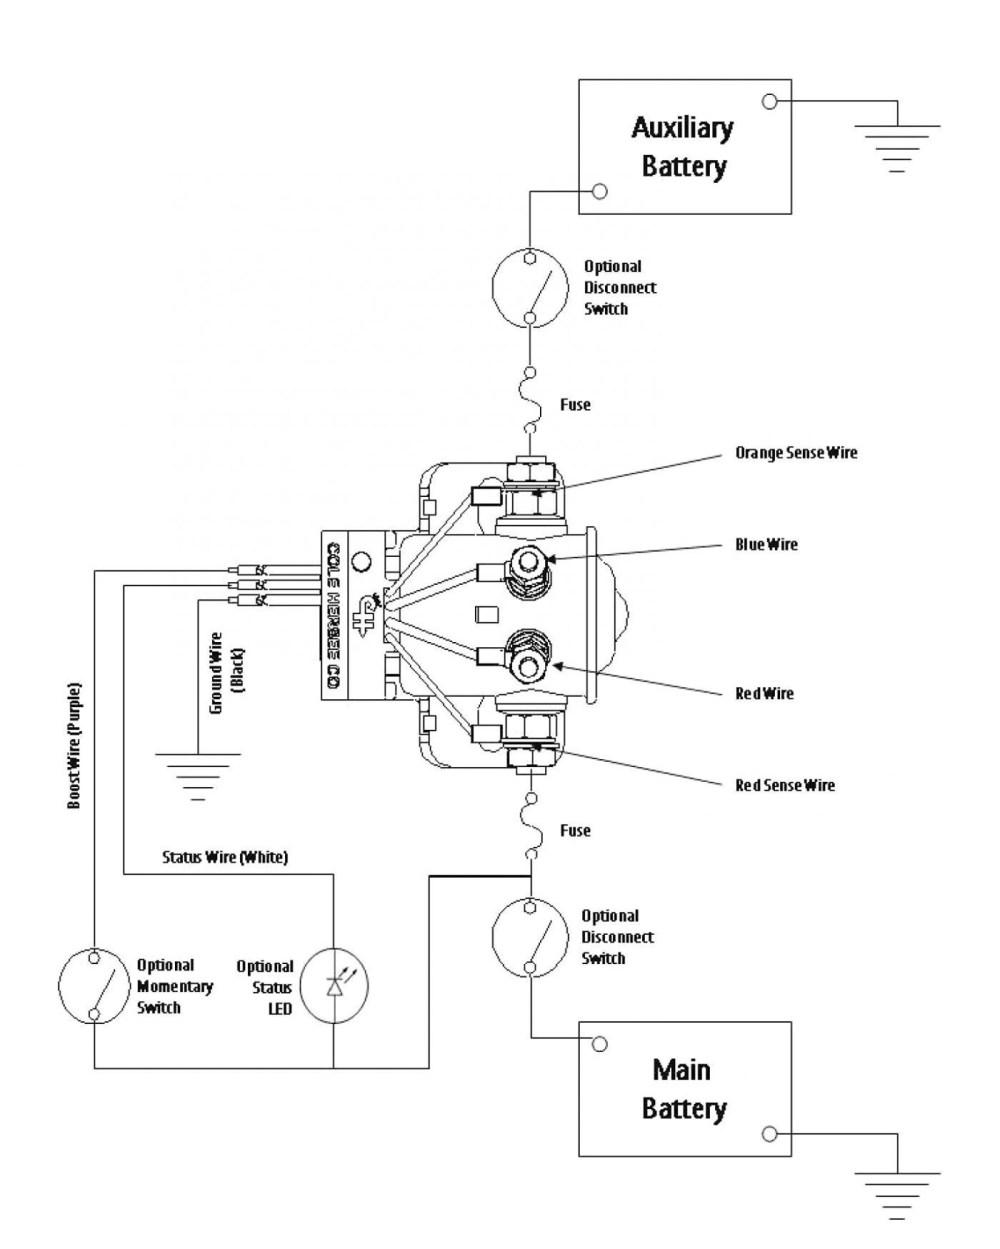 medium resolution of baldor 1 5 hp wiring diagram wiring diagram for mercury vapor light new baldor servo motor